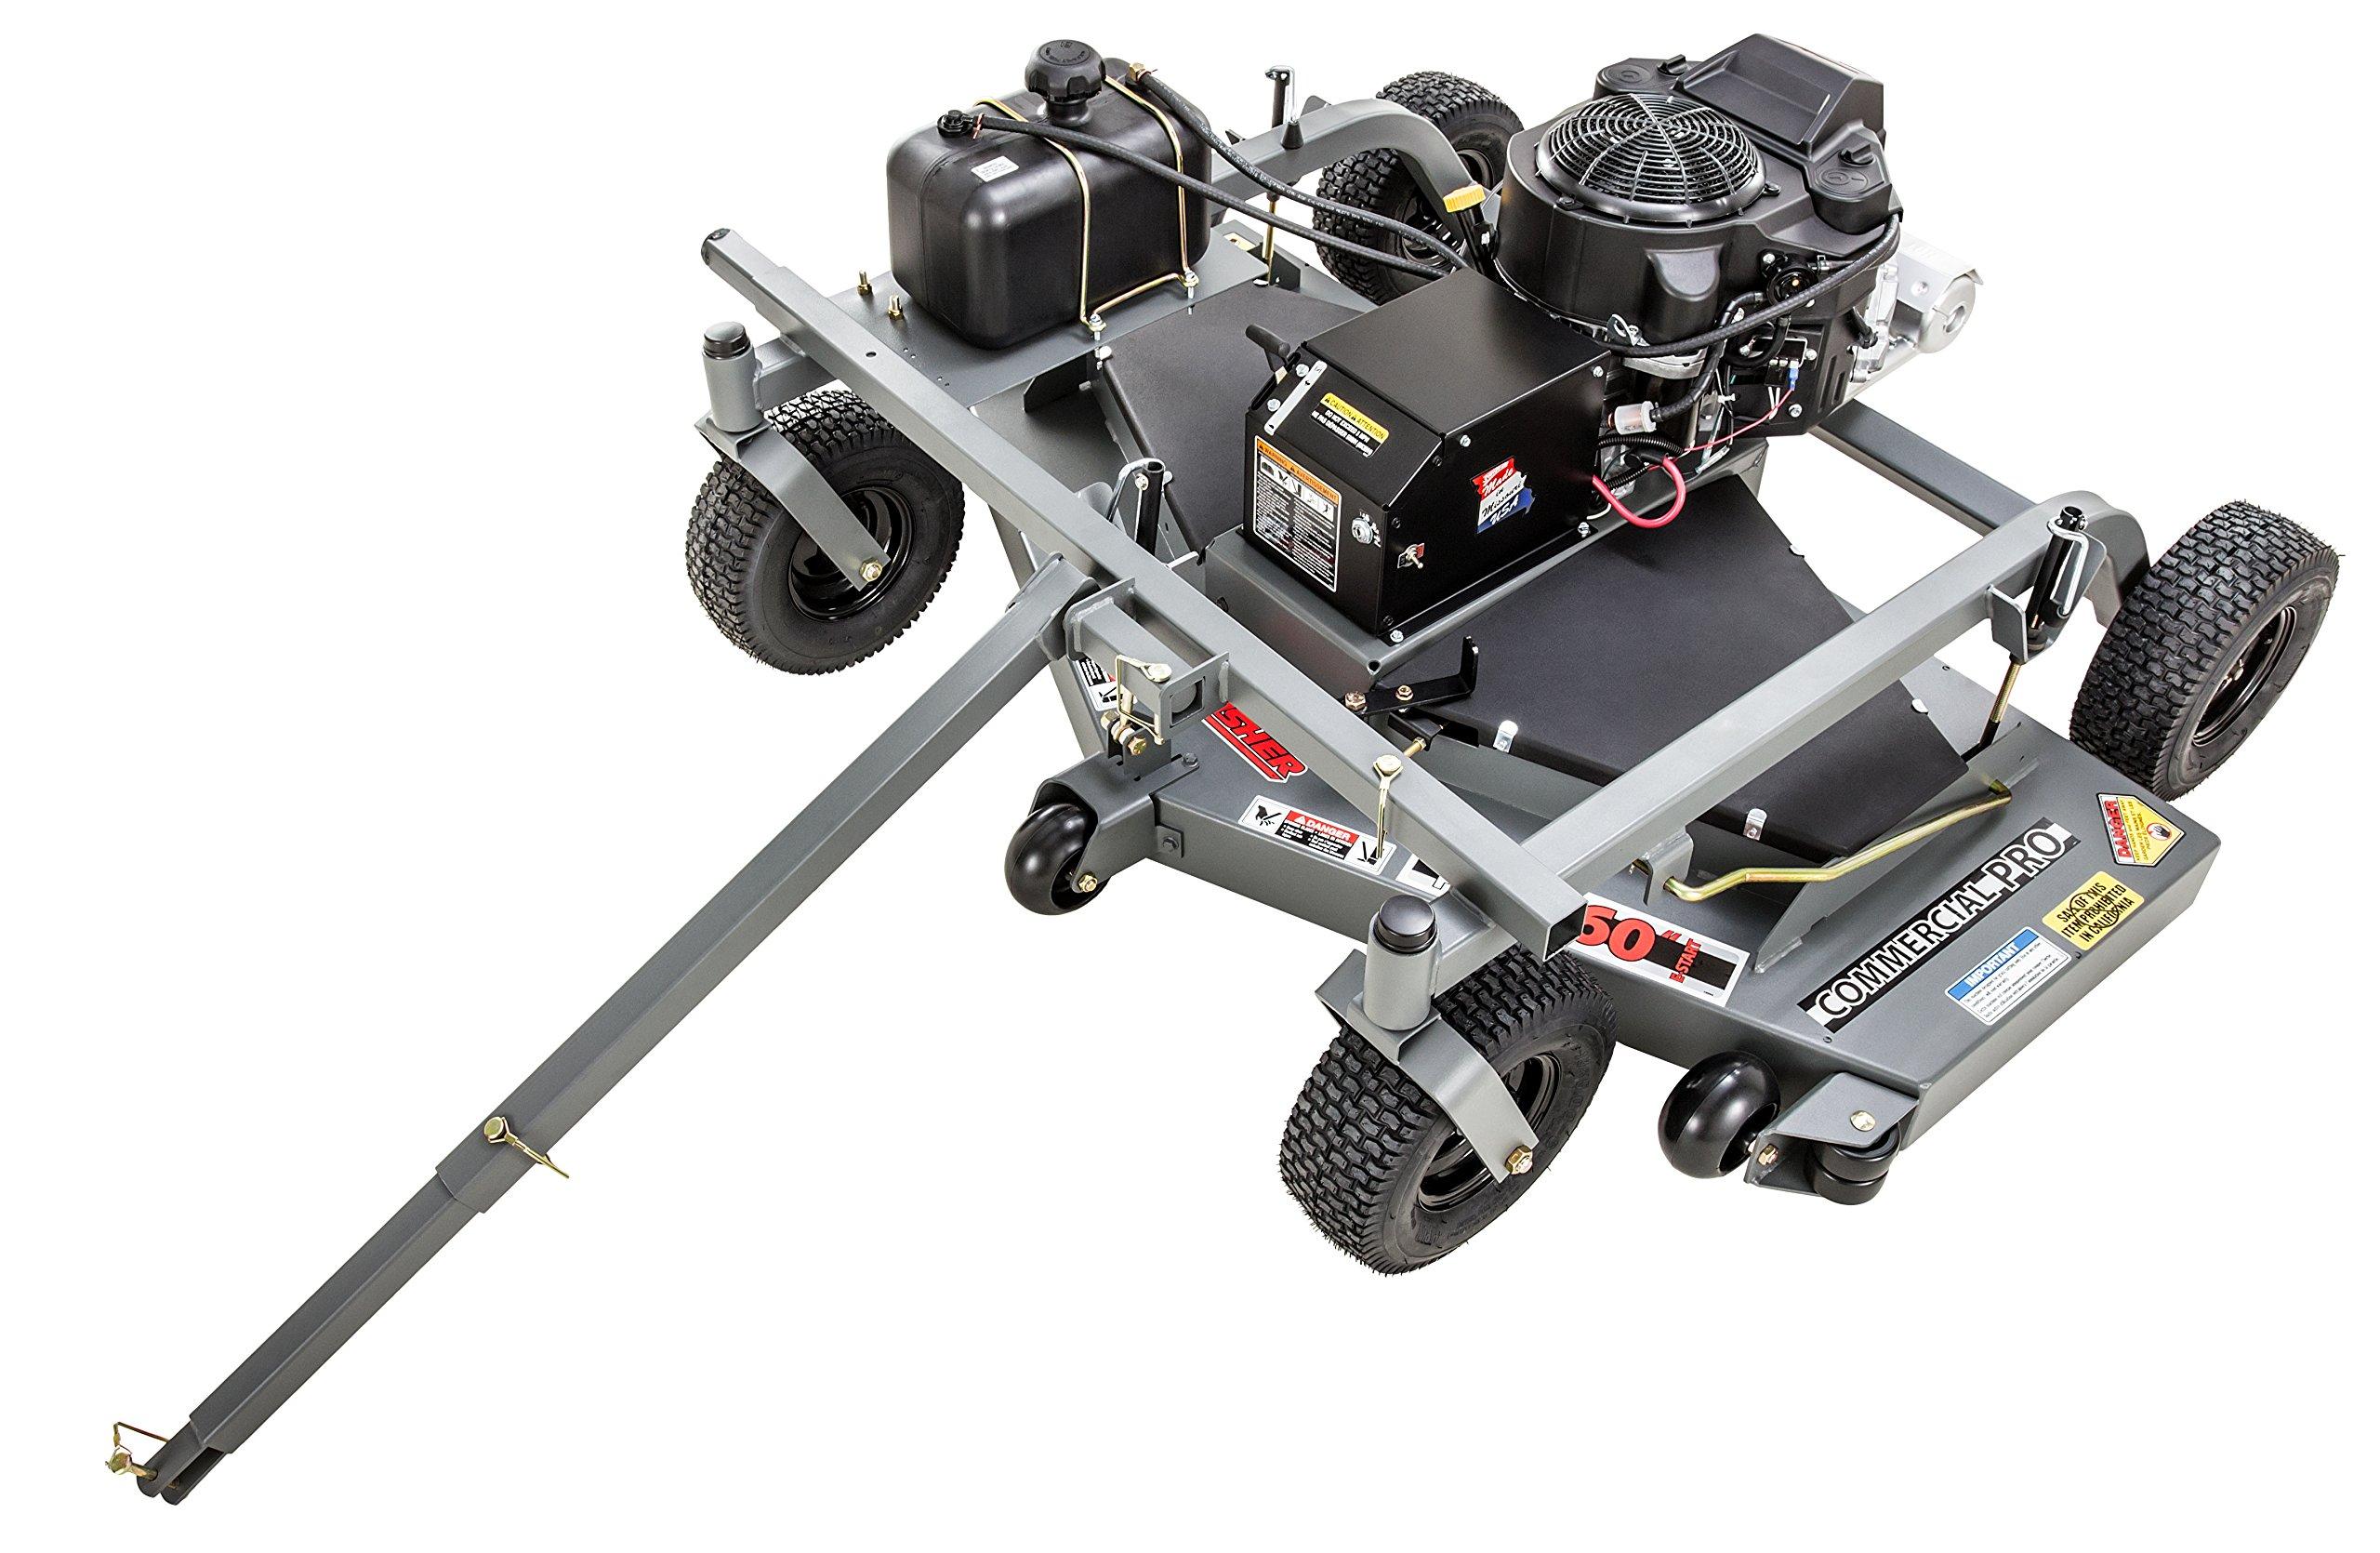 Swisher FC14560CPKA 14.5HP 12V Kawasaki Commercial Pro Trail Mower, Gray, 60''